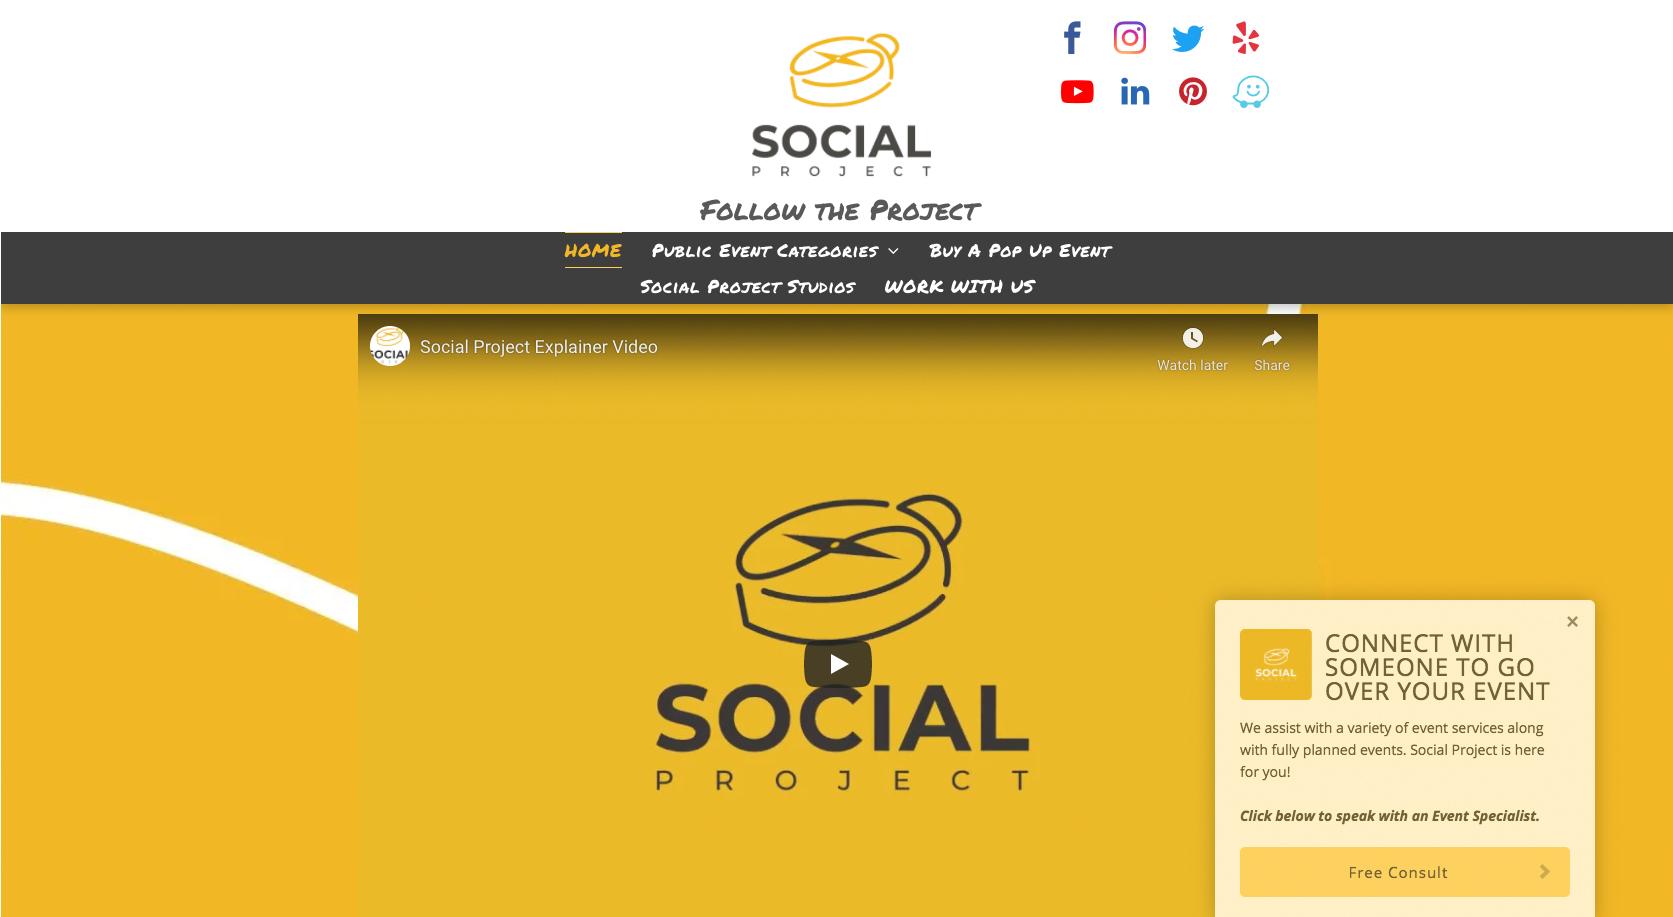 Social Project Dallas